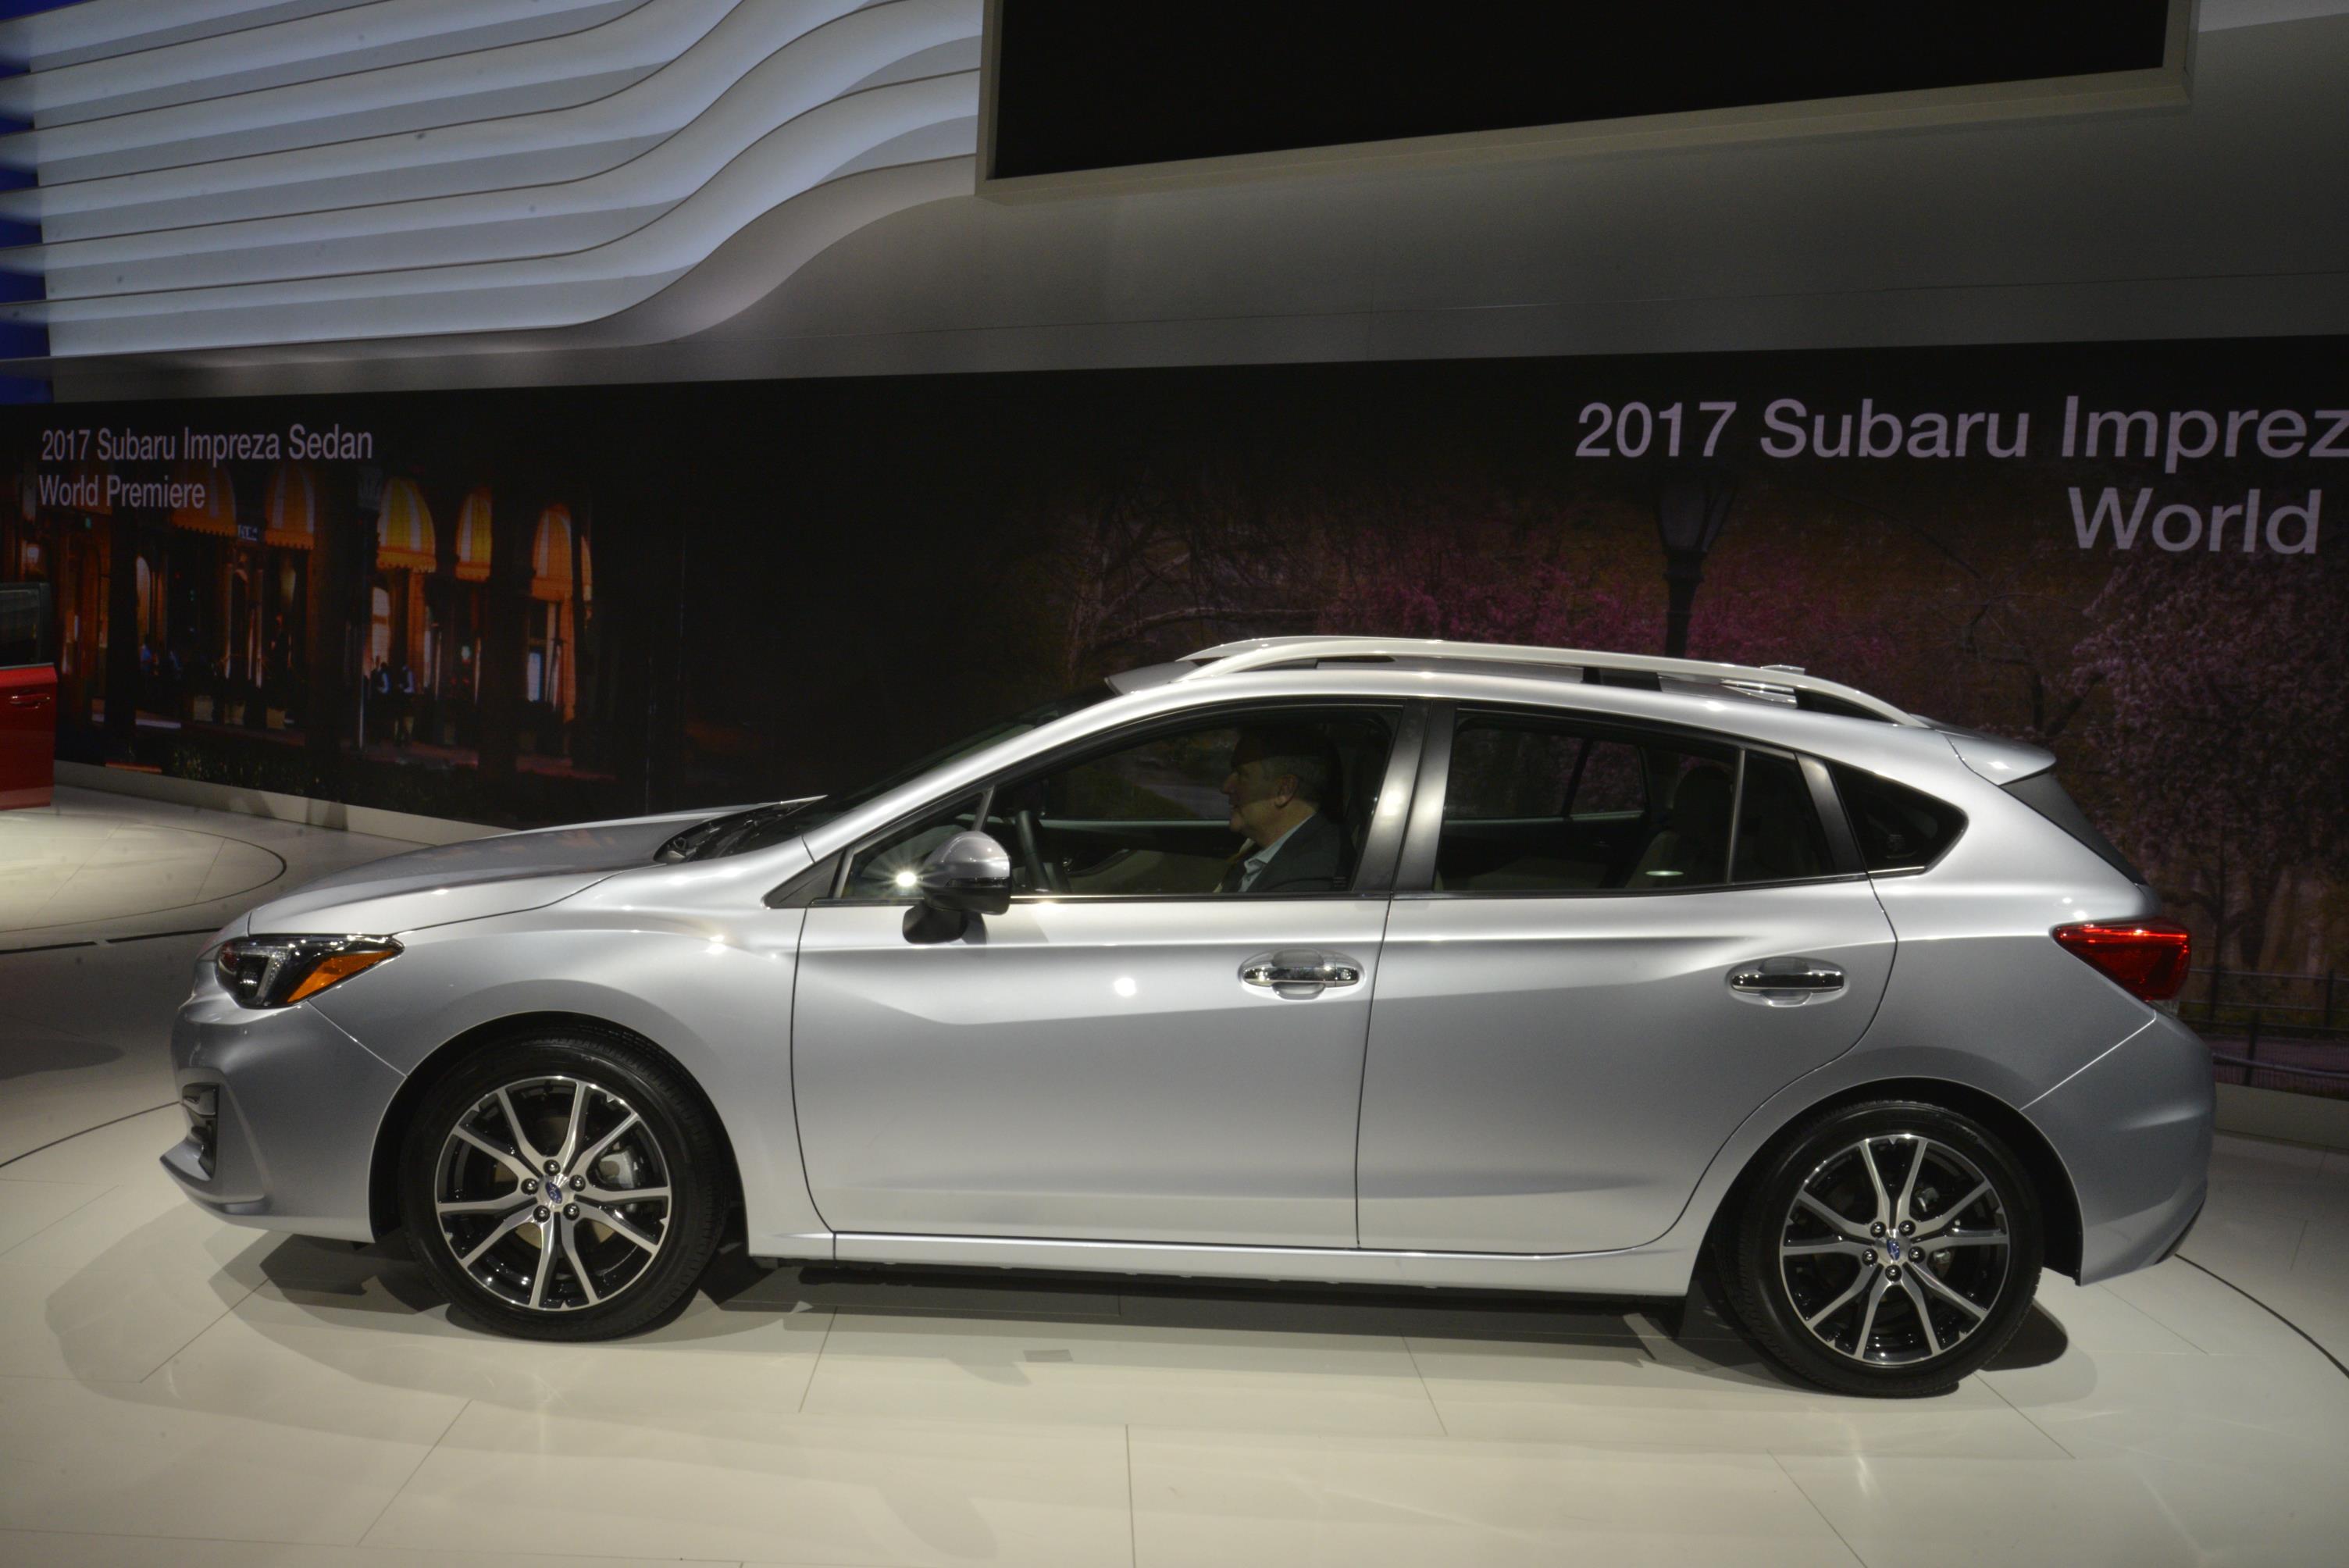 2018 Subaru Impreza WRX STI Might Look like This - autoevolution